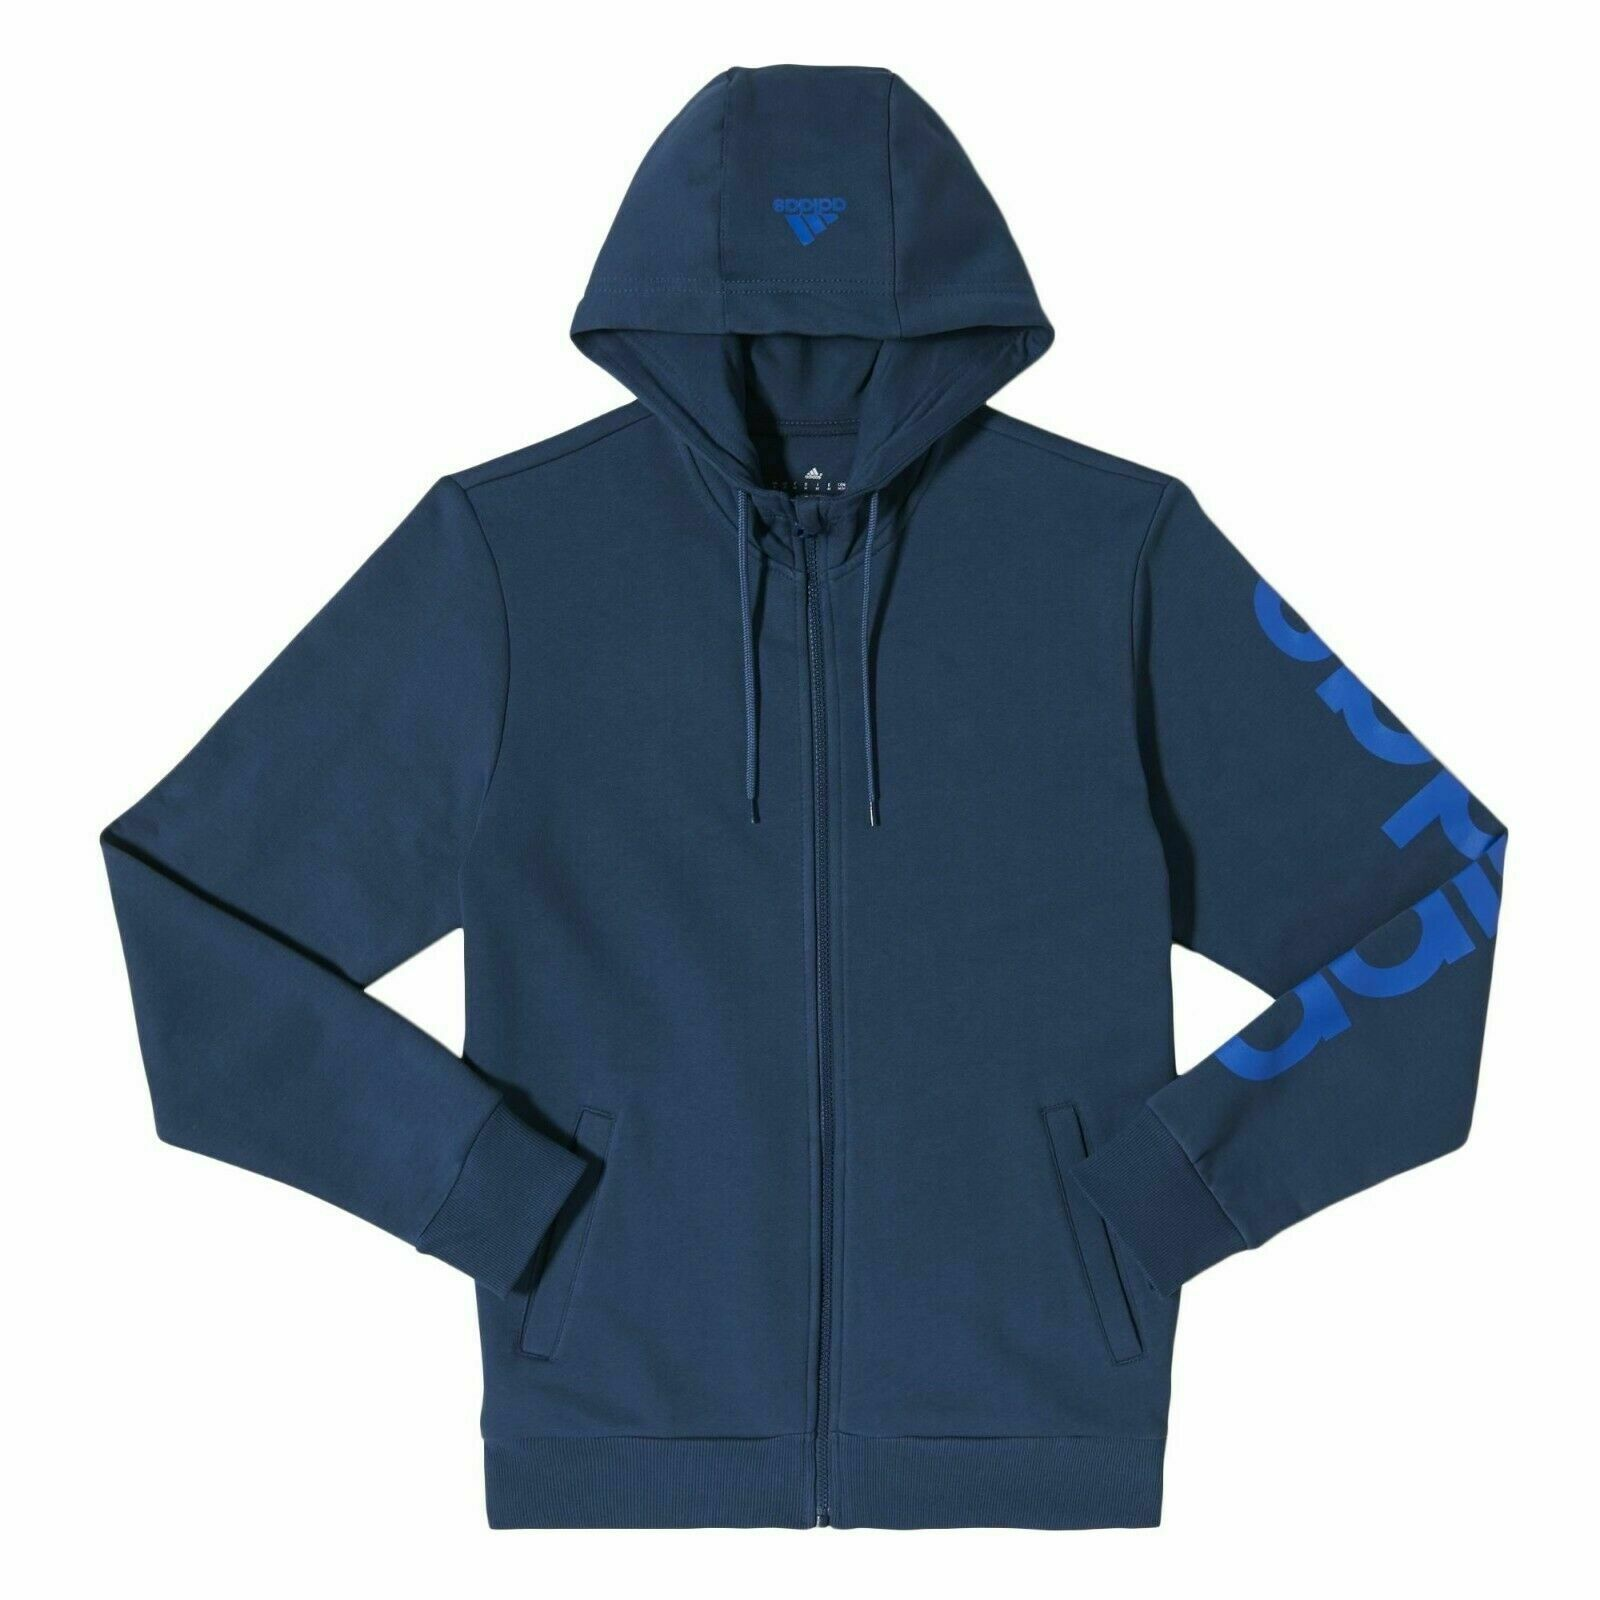 Adidas Essentials Linear Men's Sweat à Capuche Bleu Marine Pull Zip Complet Chaud Fitness | eBay